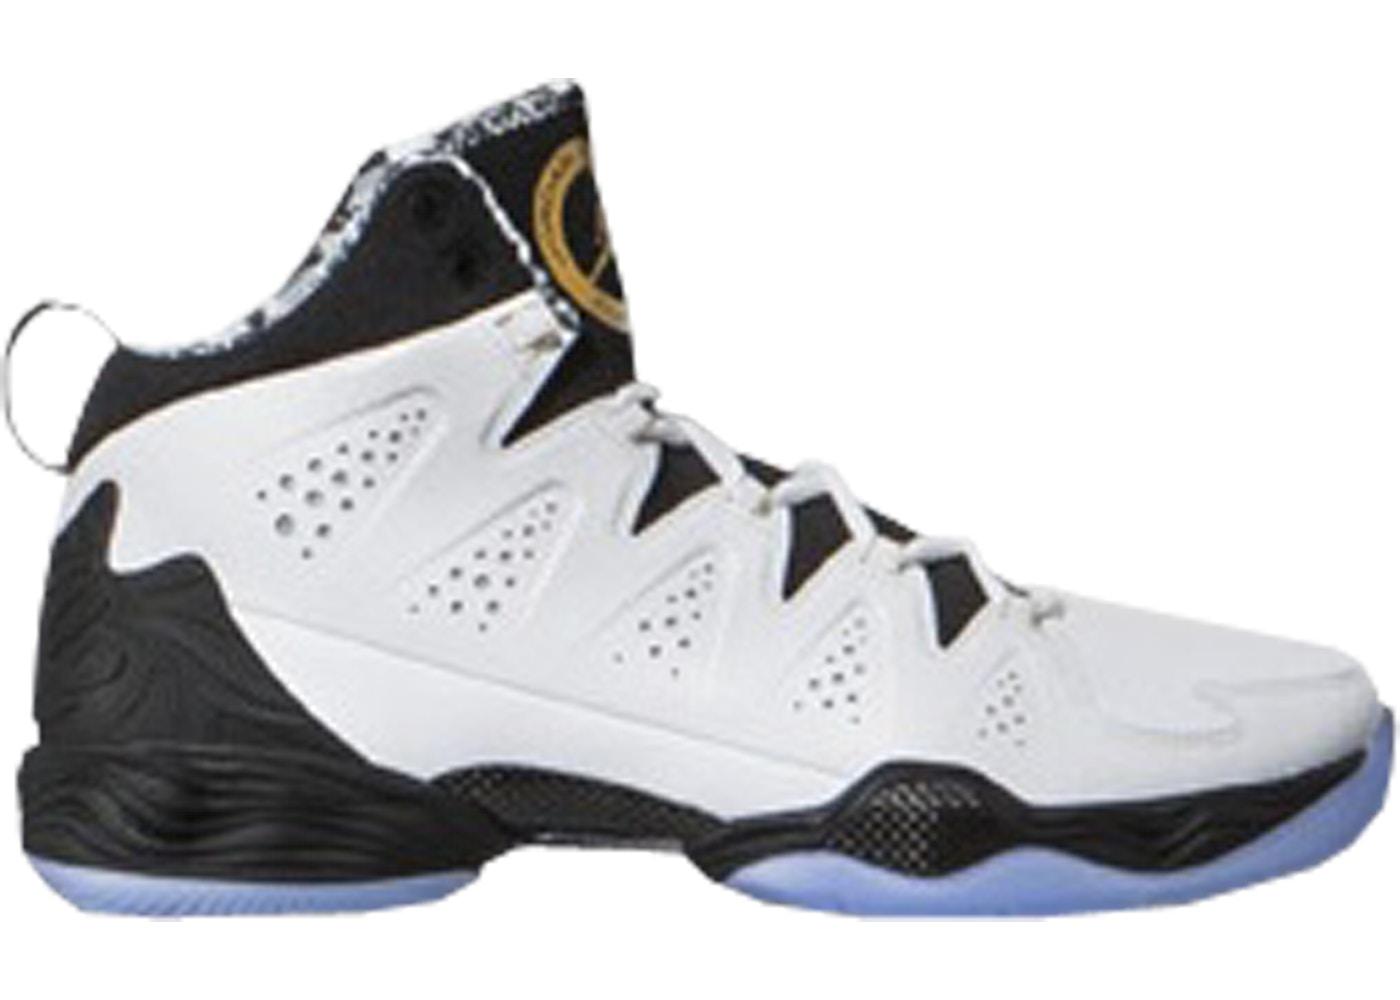 088c01c1c24 Jordan Melo M10 Jordan Brand Classic West - 682784-125